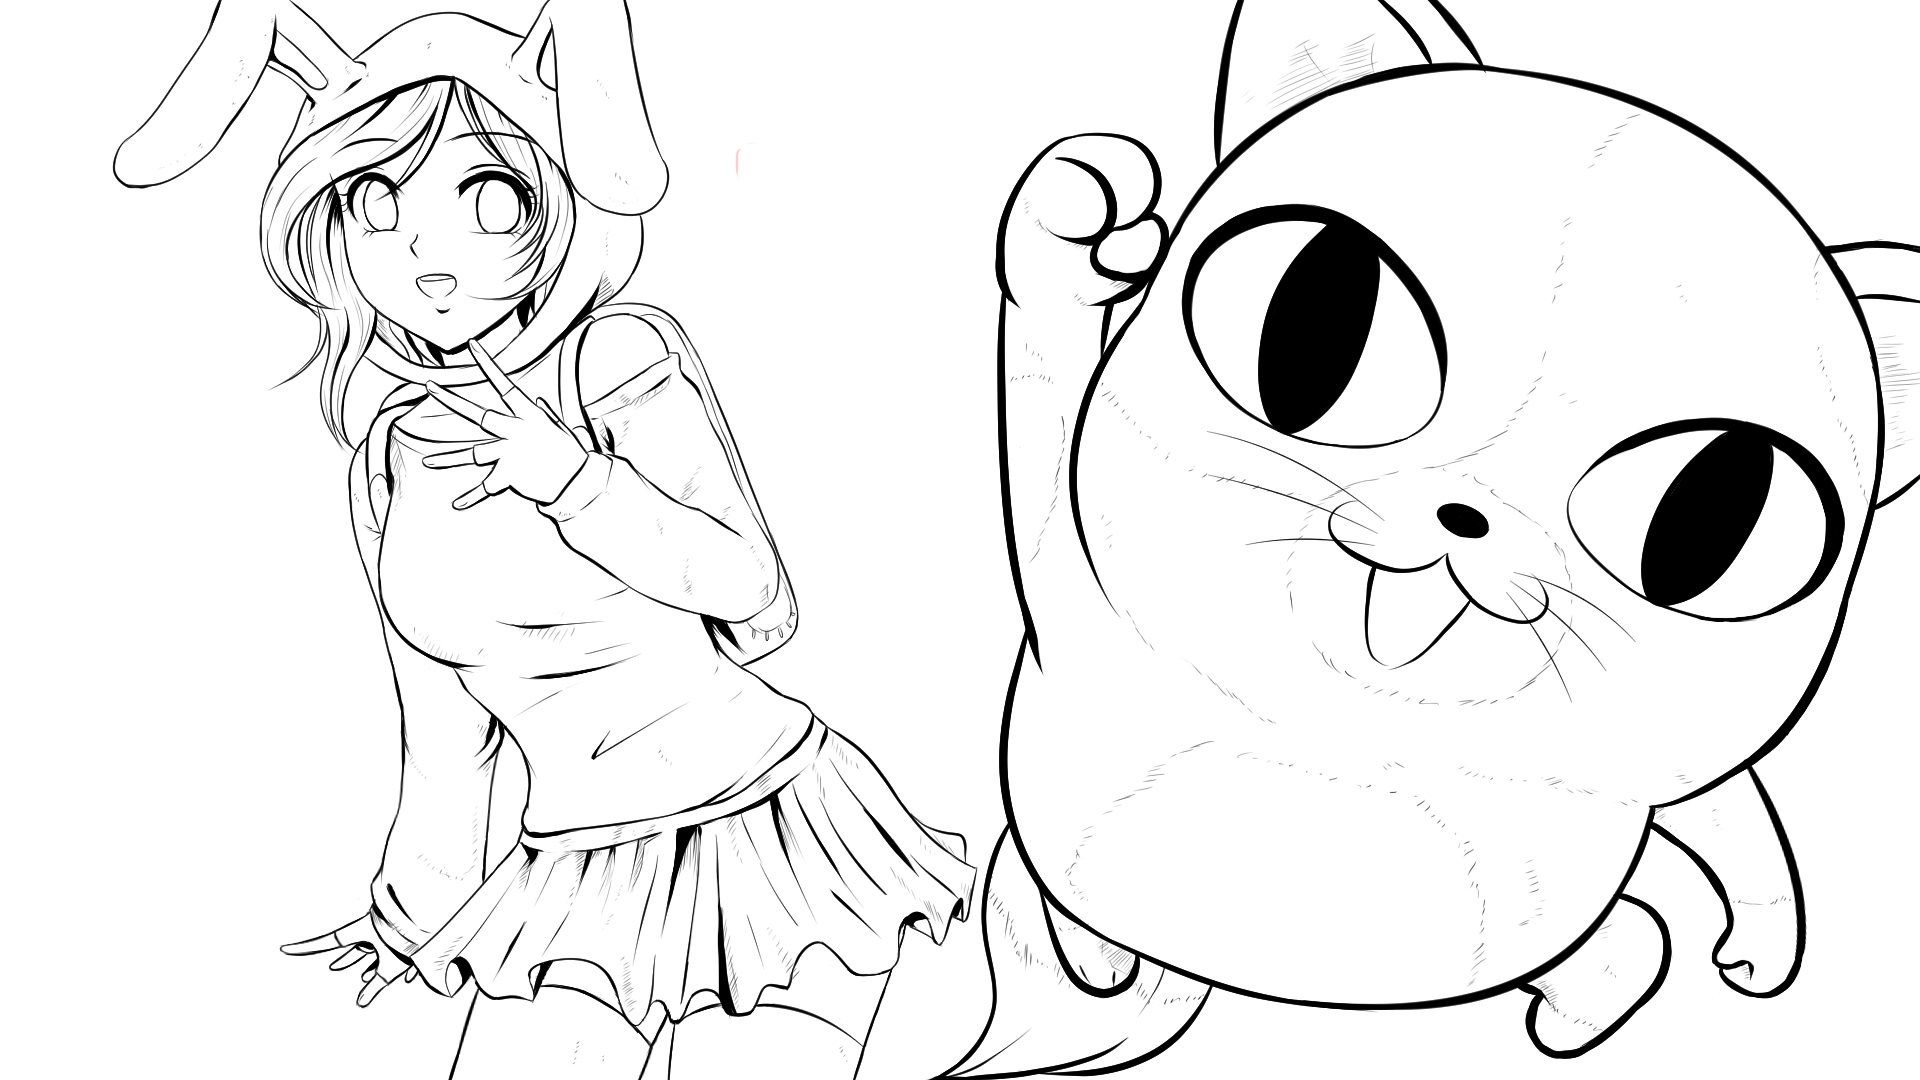 fionna and cake (anime/manga version)